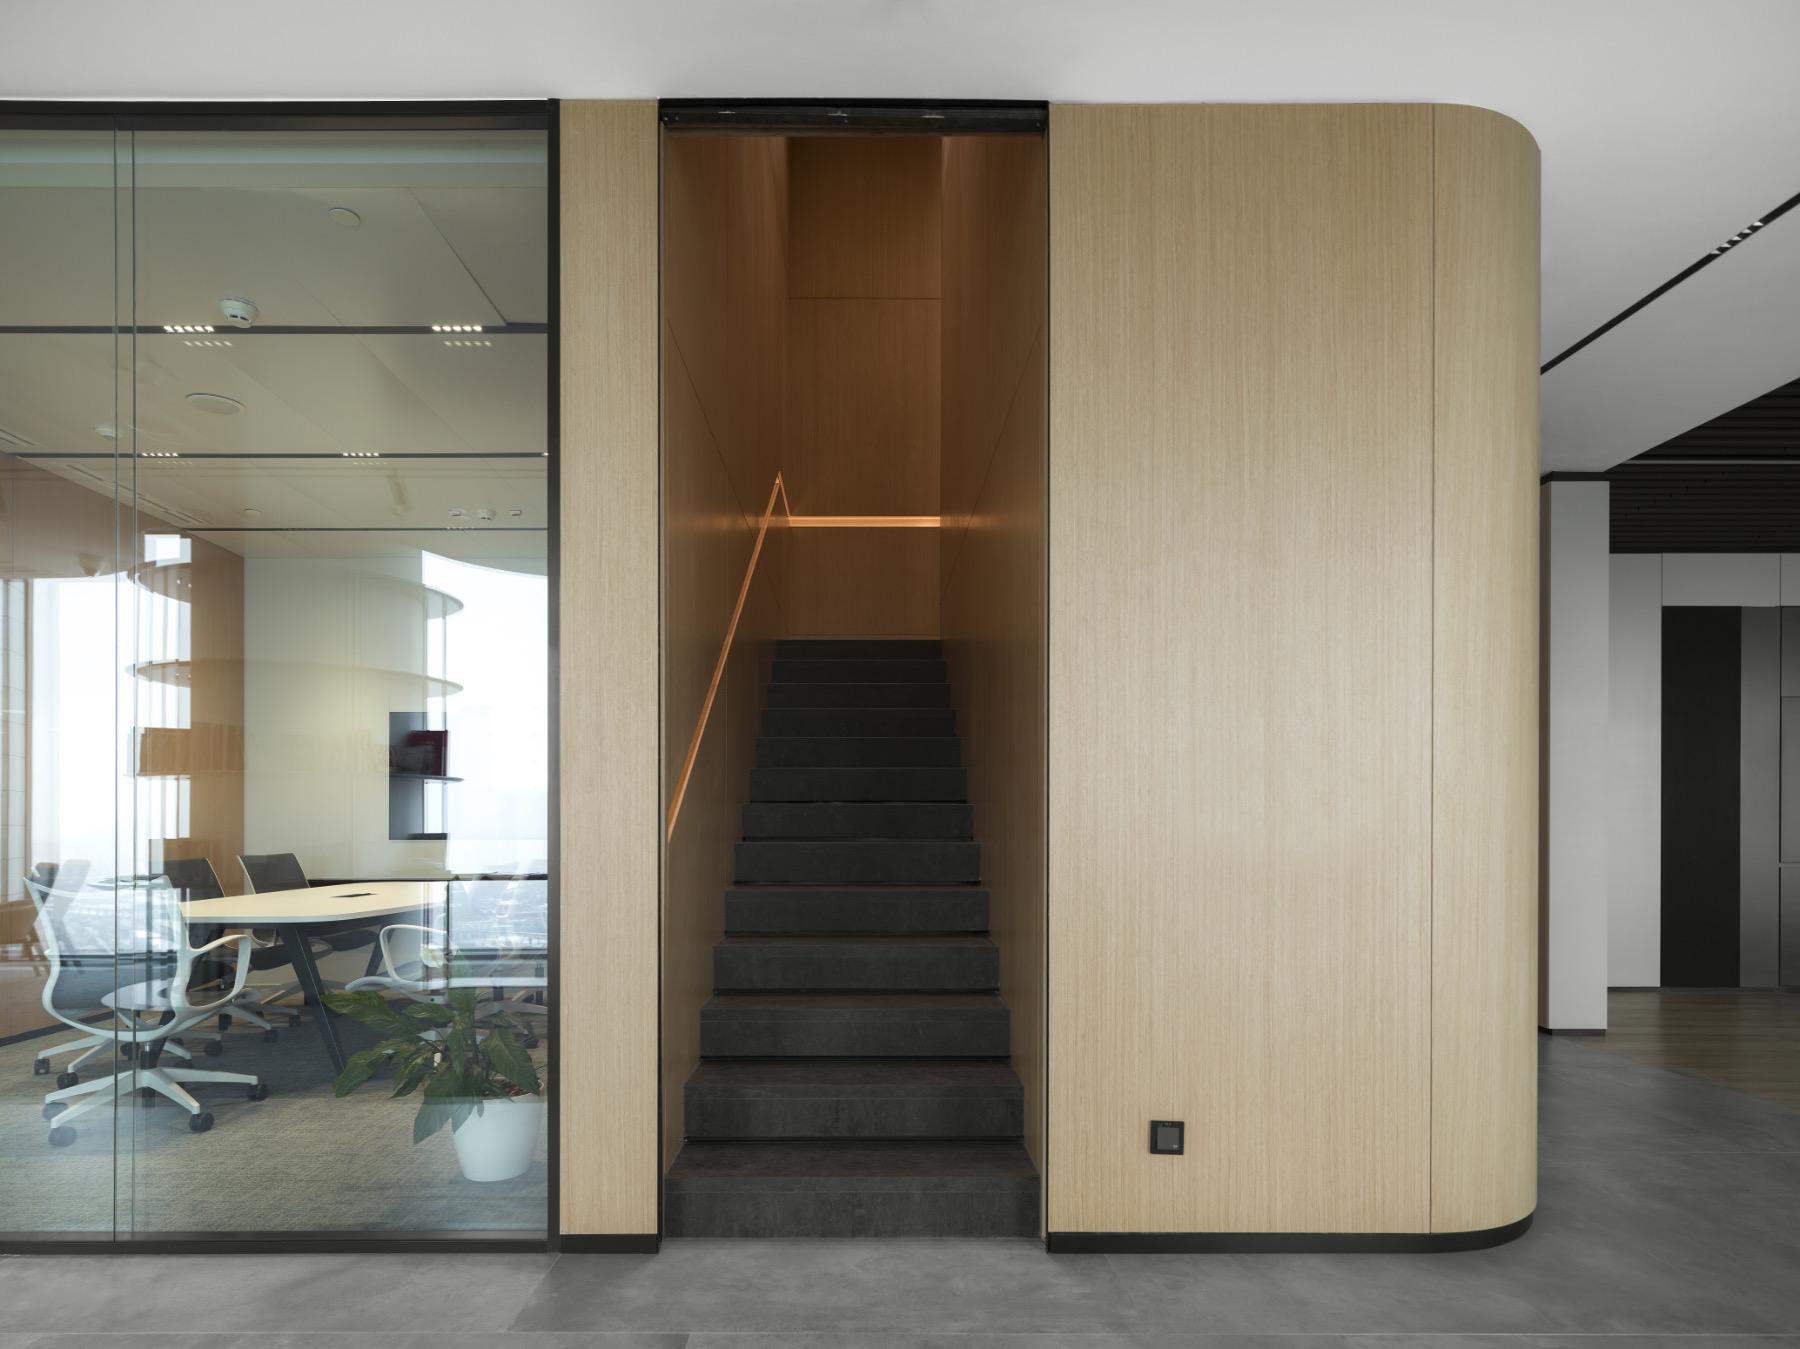 hyundai-moscow-office-5